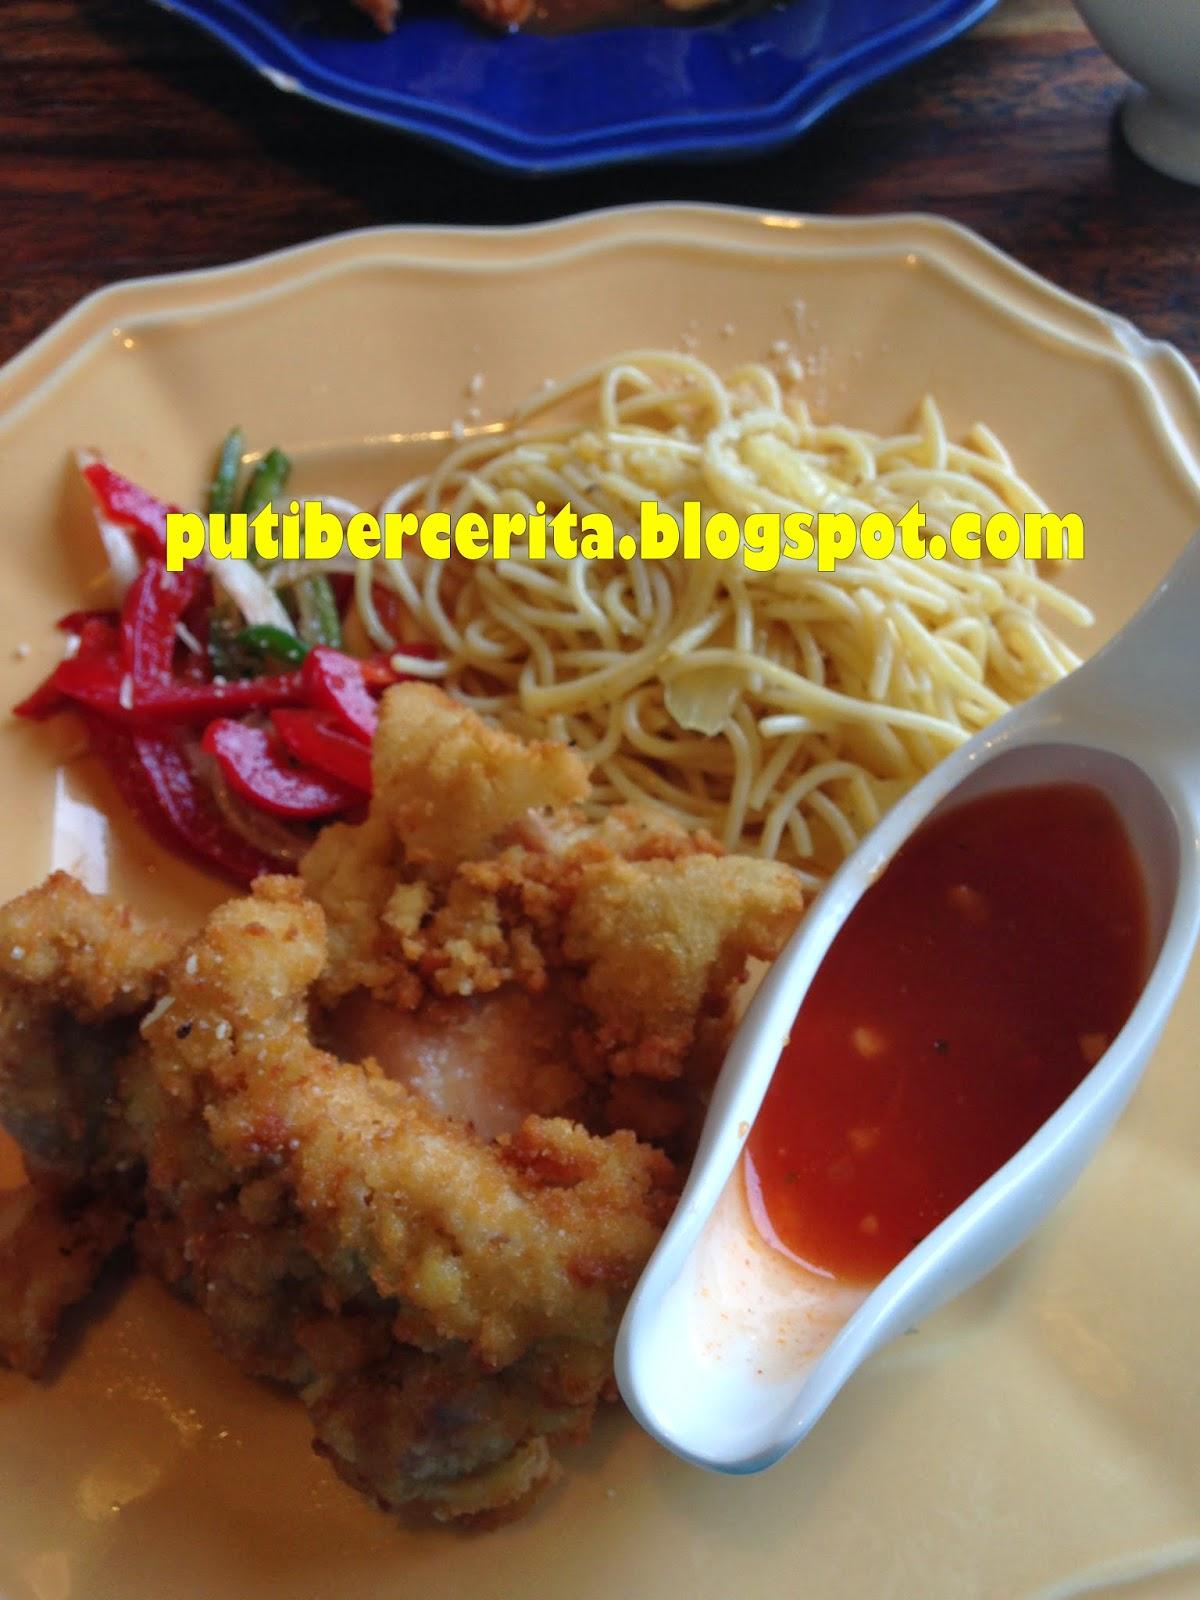 Wisata Kuliner di Semarang? Jangan lupa Coba Jajanan Ini! Ada yang mirip Tacos!